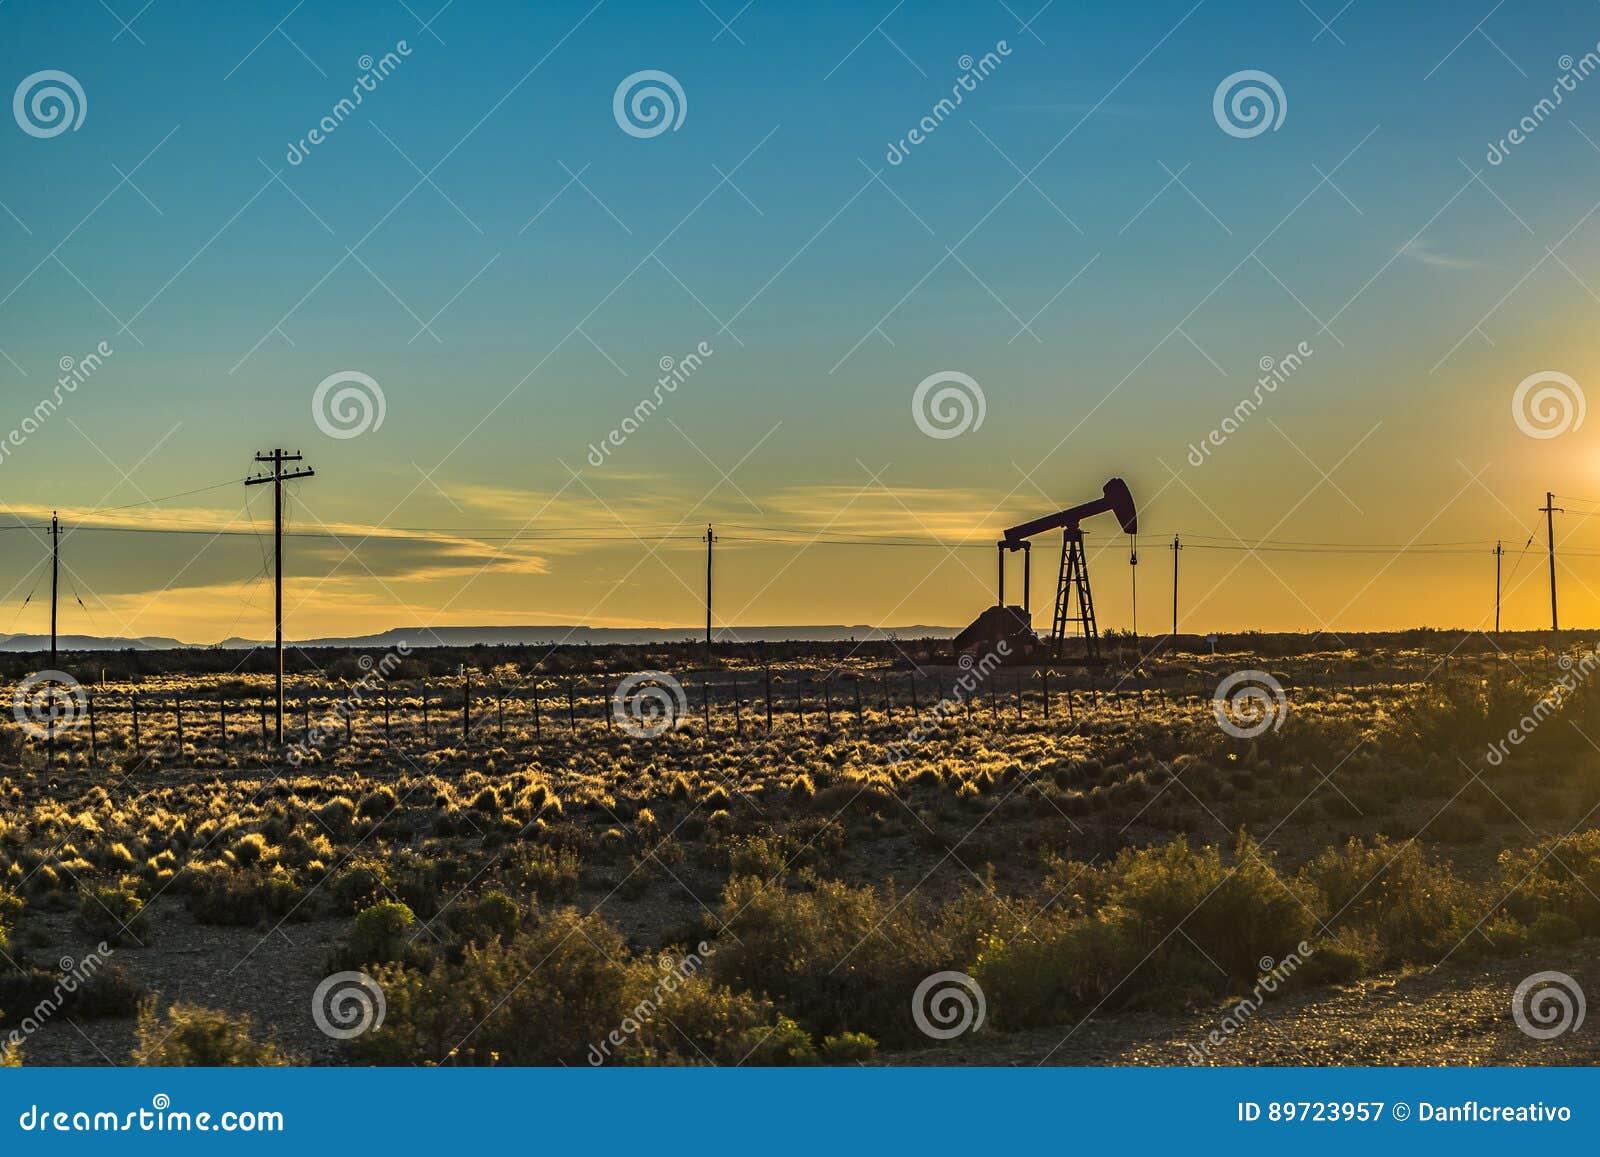 Oil Machine at Patagonian Landscape, Santa Cruz ,Argentina